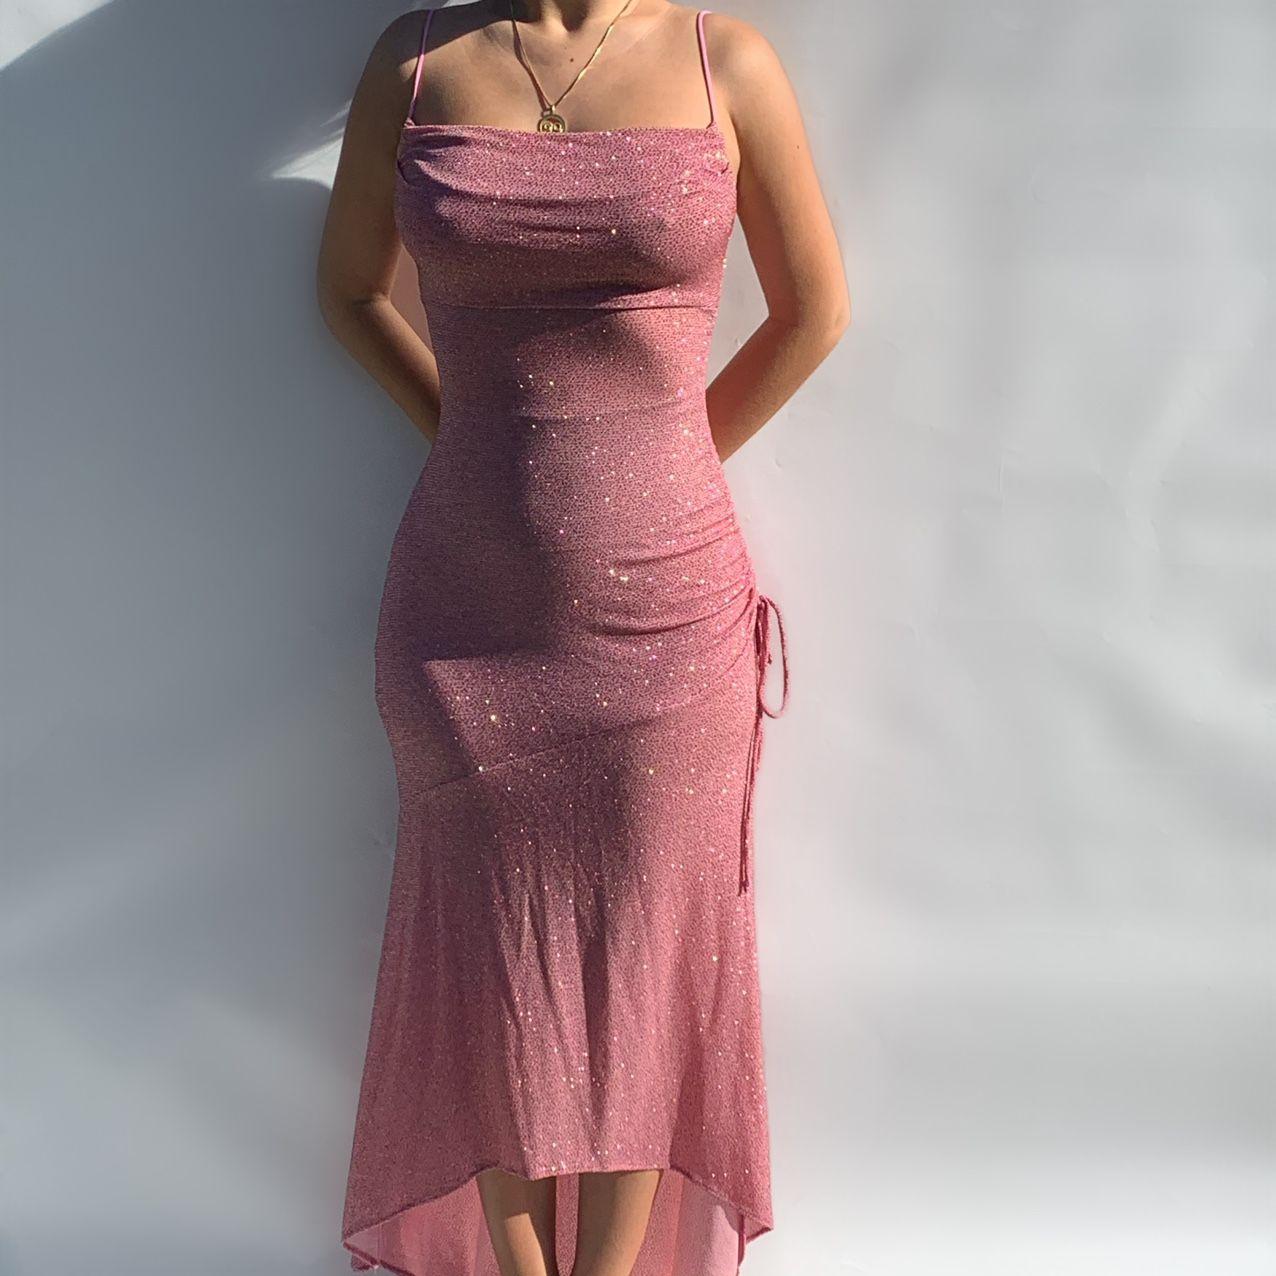 Iridescent Shimmering Light Pink Dress Still Depop Pink Formal Dresses Prom Outfits Dresses [ 1276 x 1276 Pixel ]